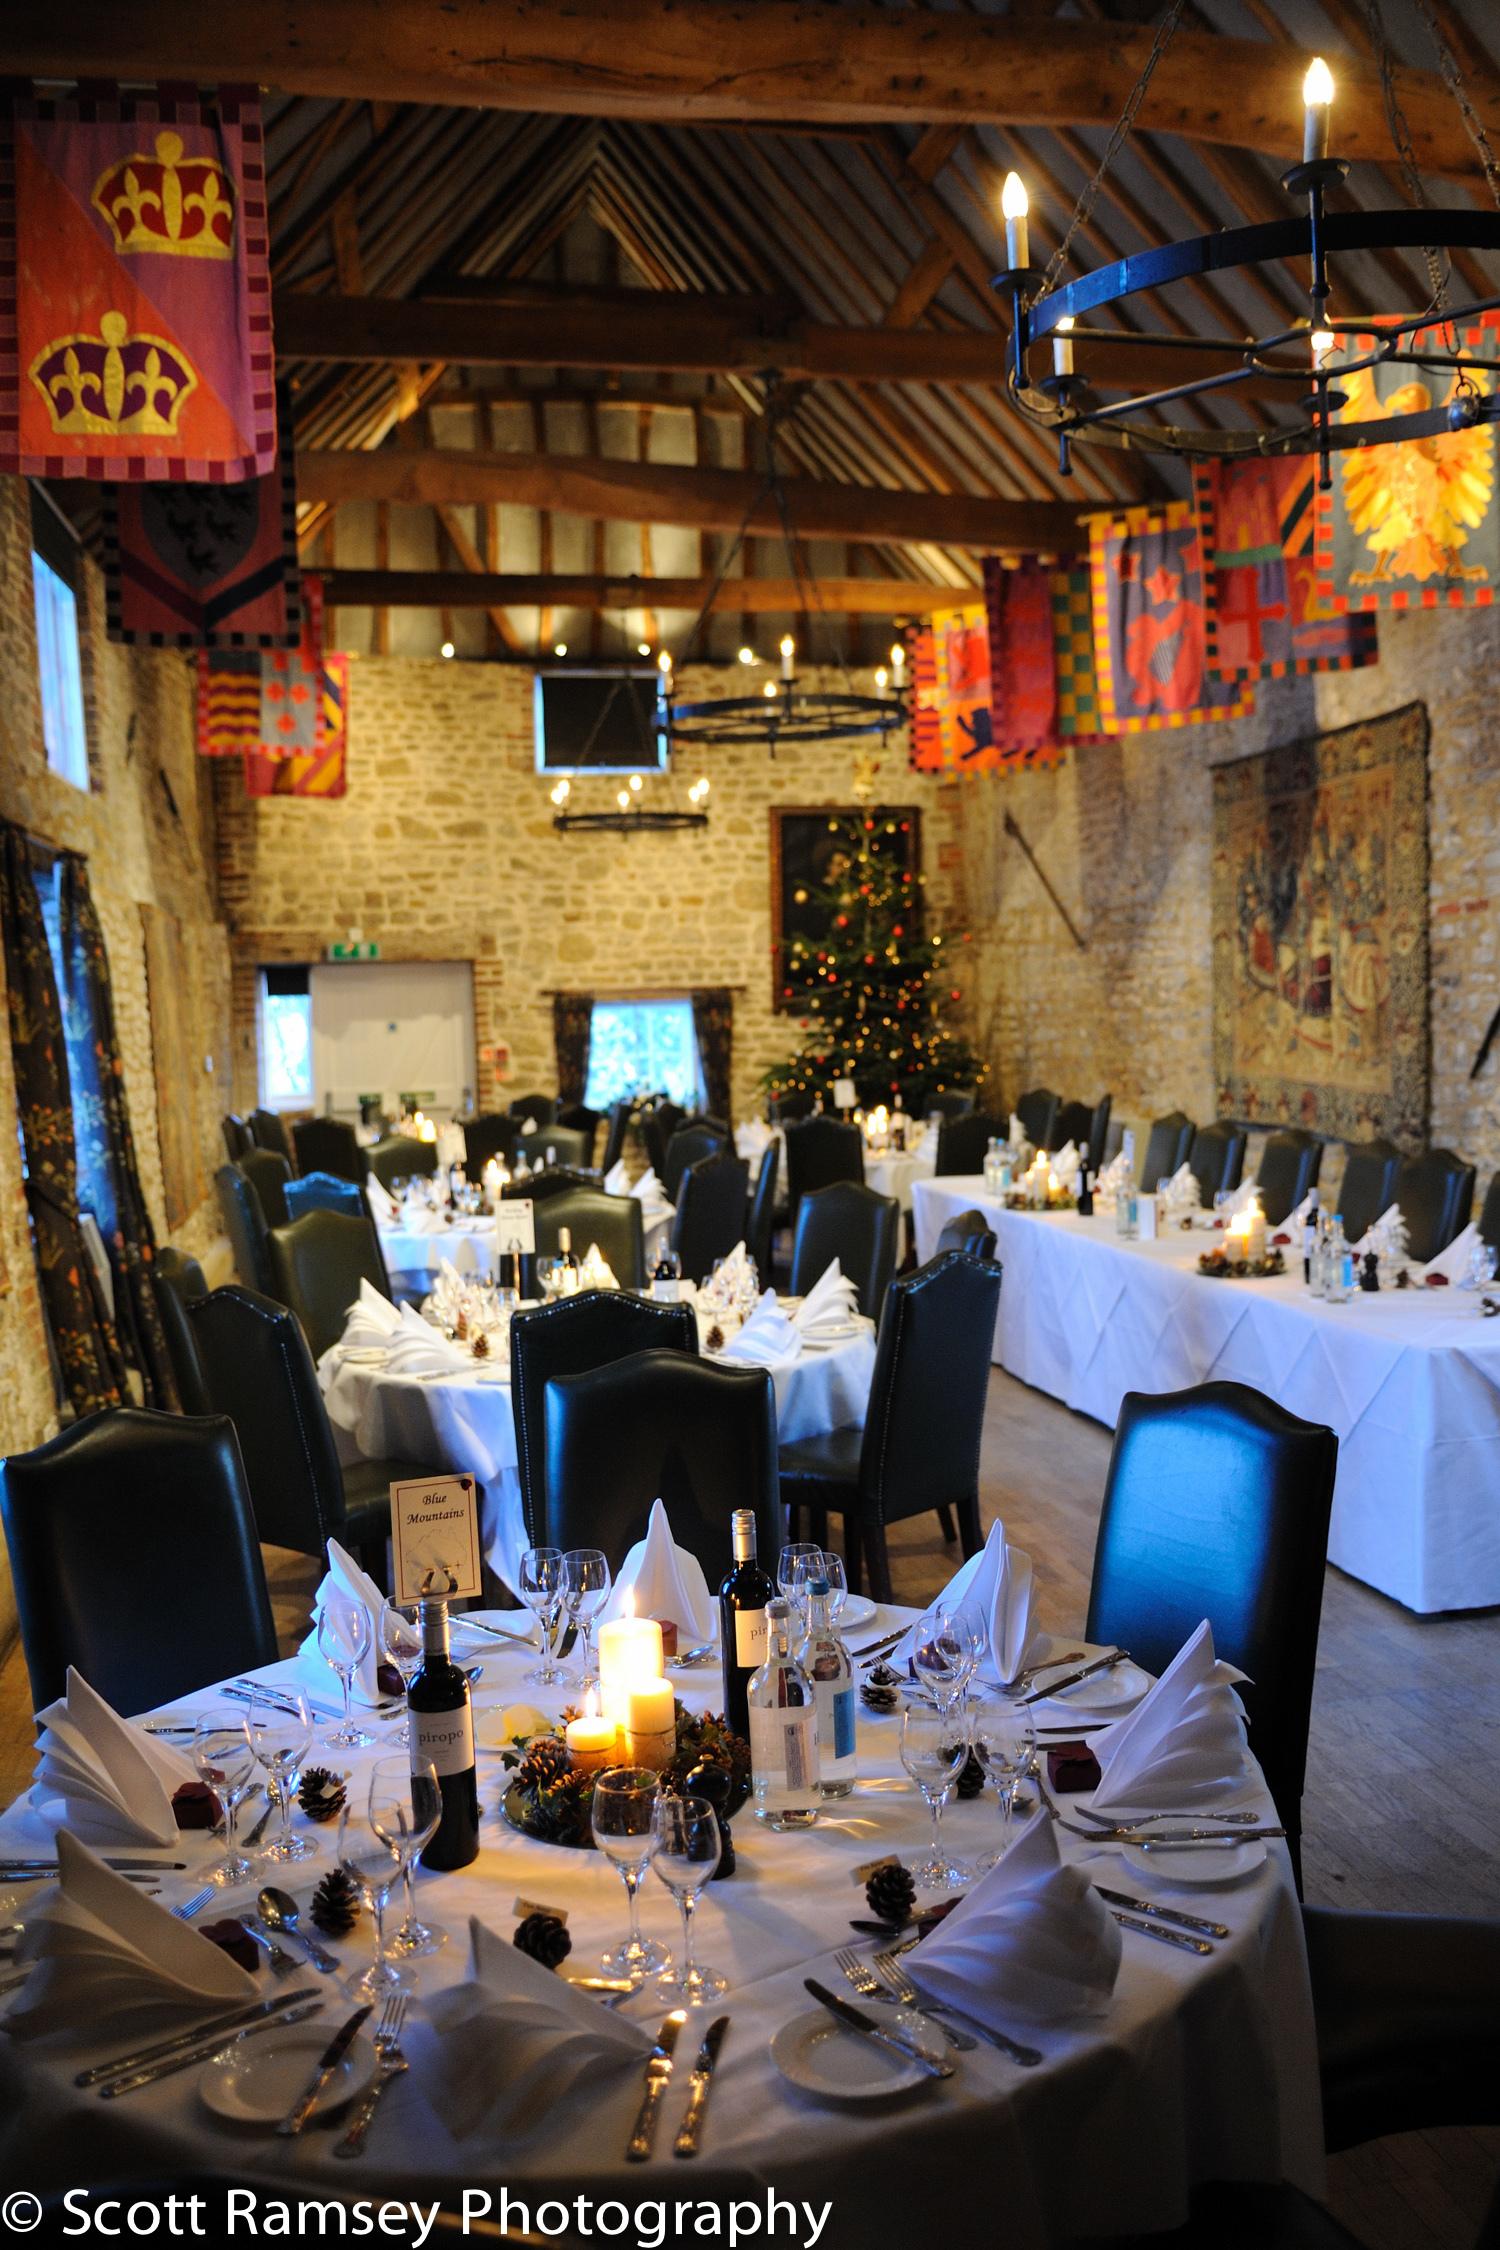 Winter-Wedding-Spread-Eagle-Hotel-Midhurst-Jacobean-Hall-031210-